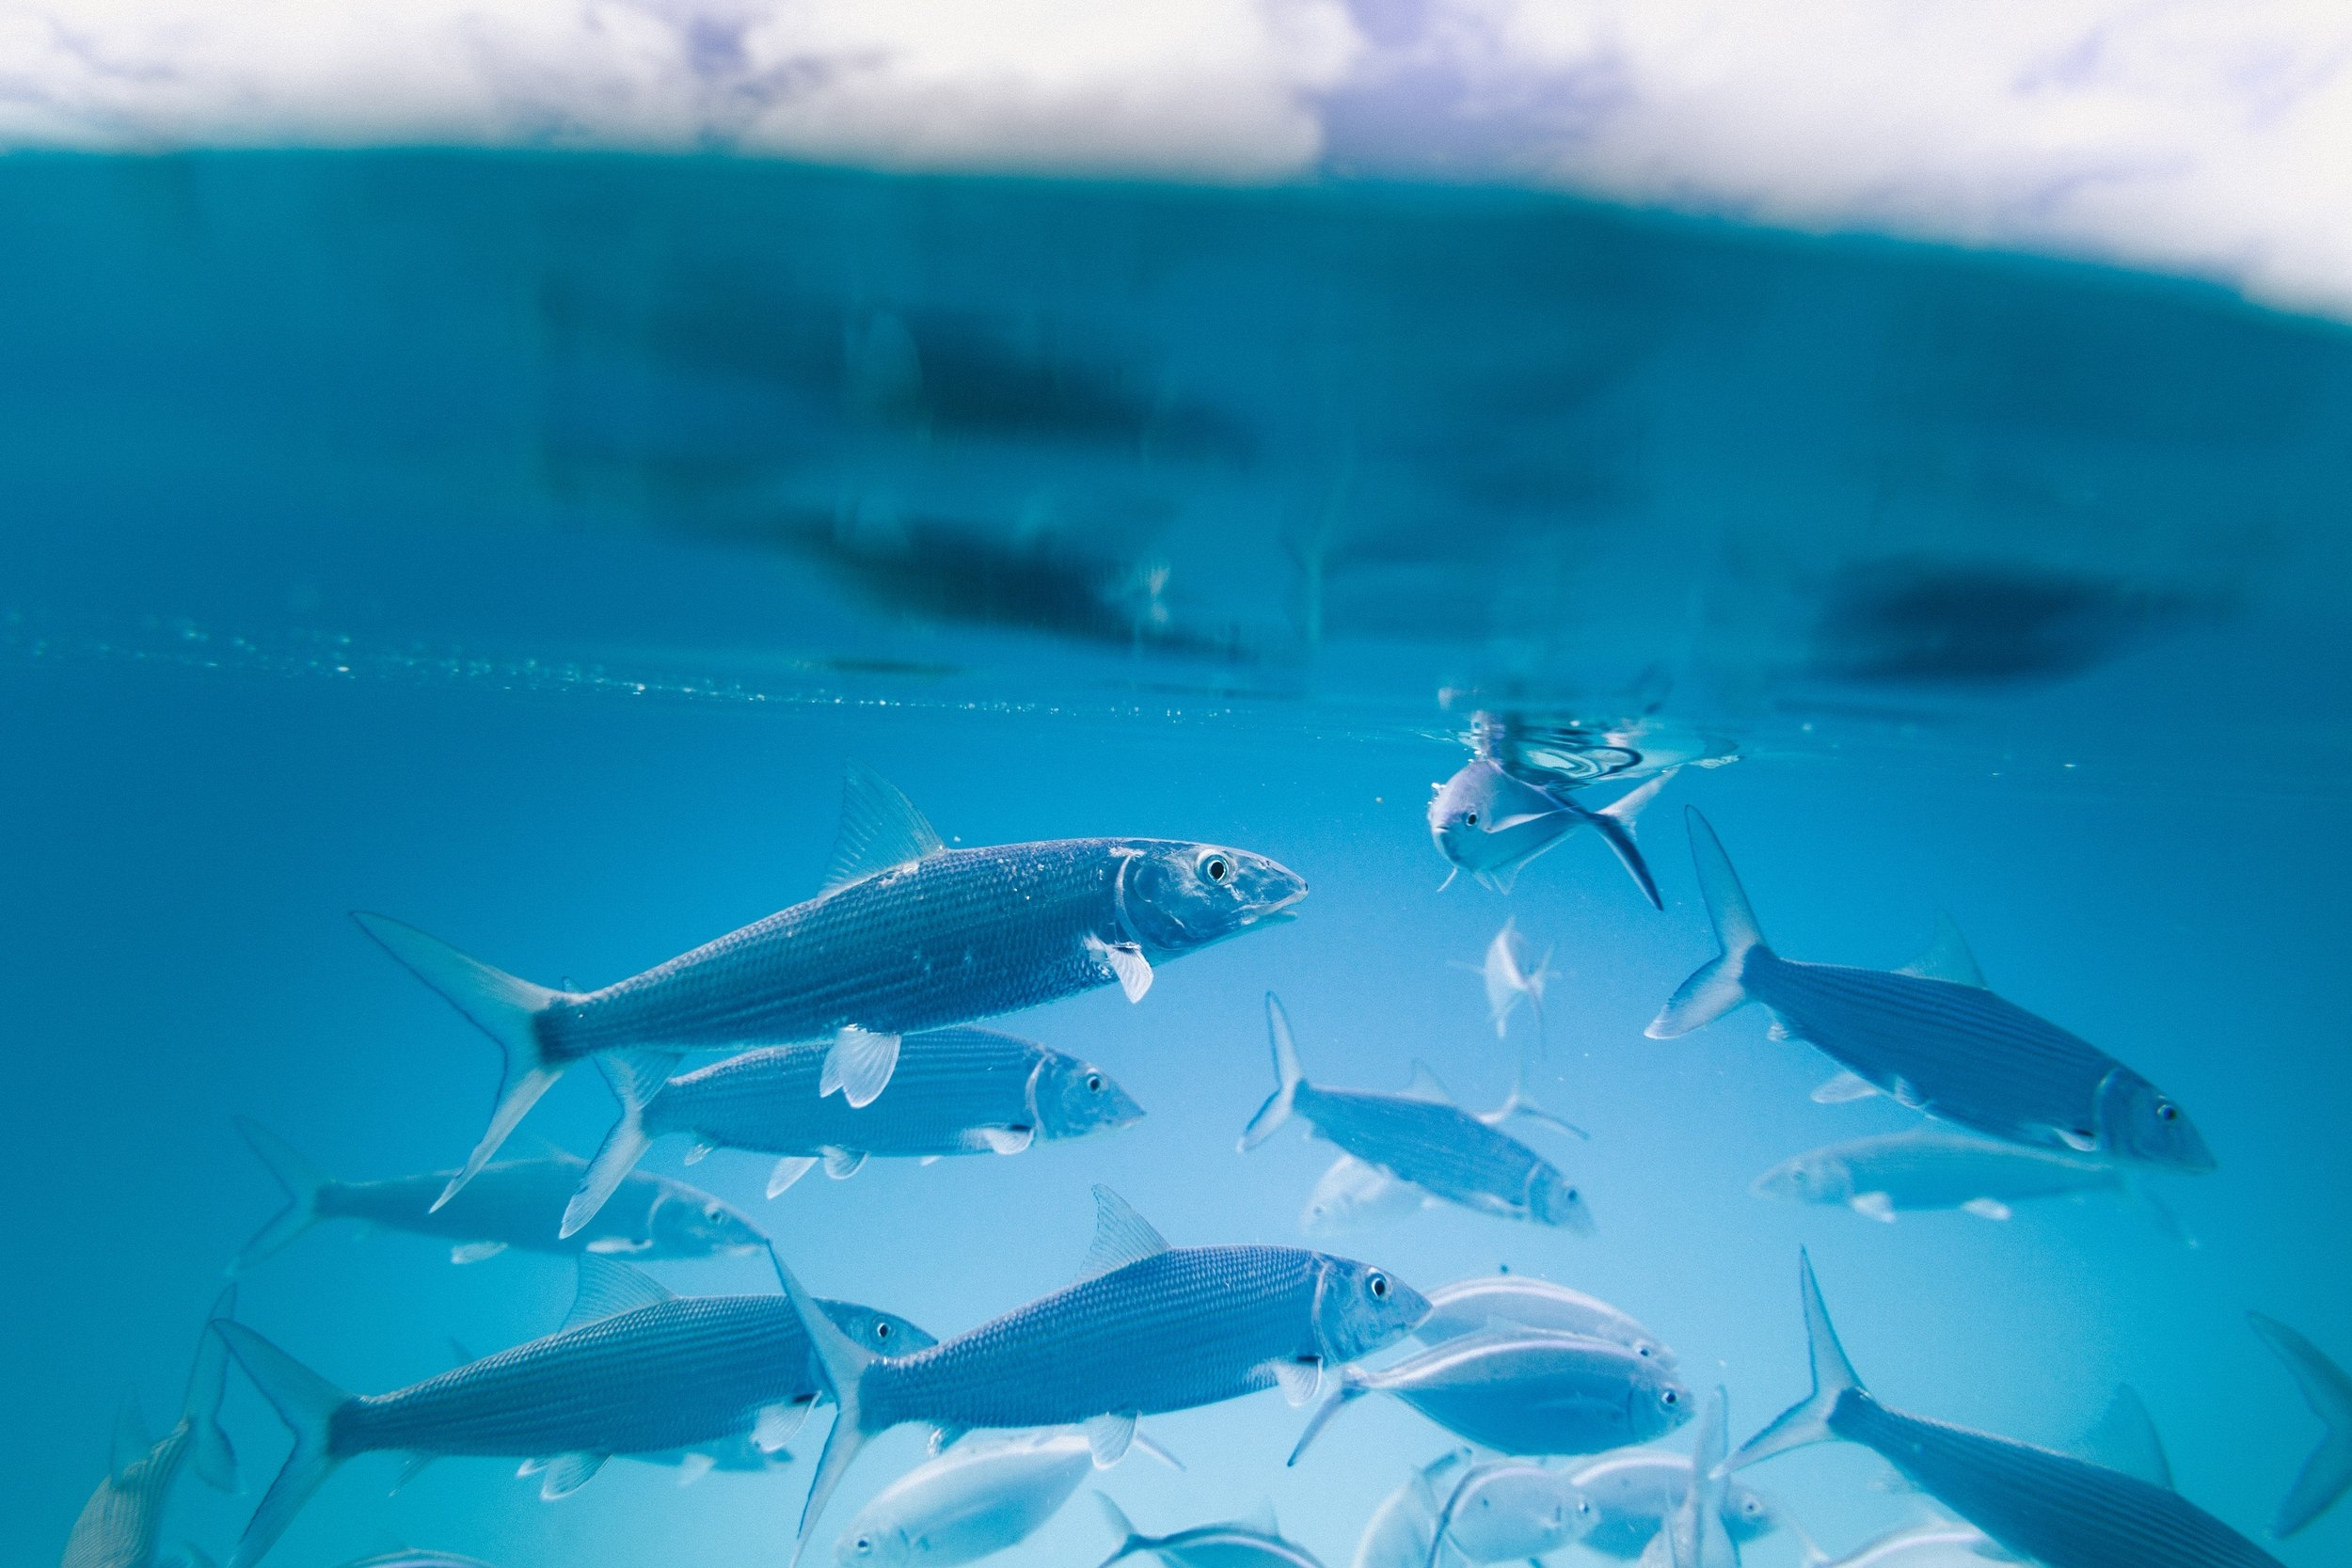 Live bait -